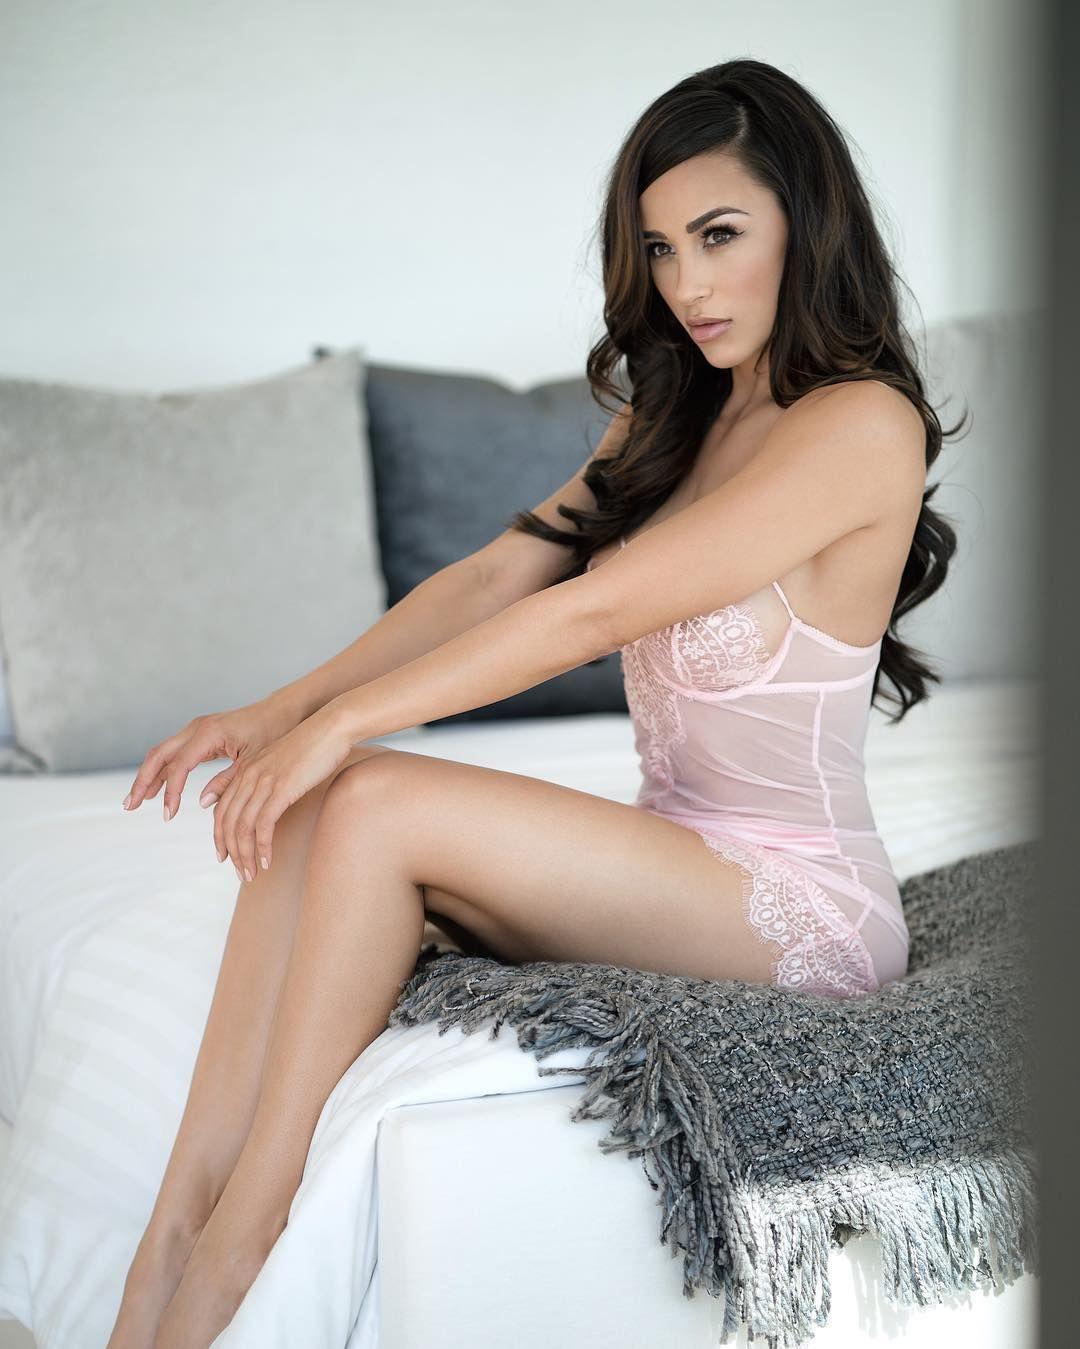 Aryana Augustine nudes (19 fotos), video Paparazzi, iCloud, swimsuit 2016